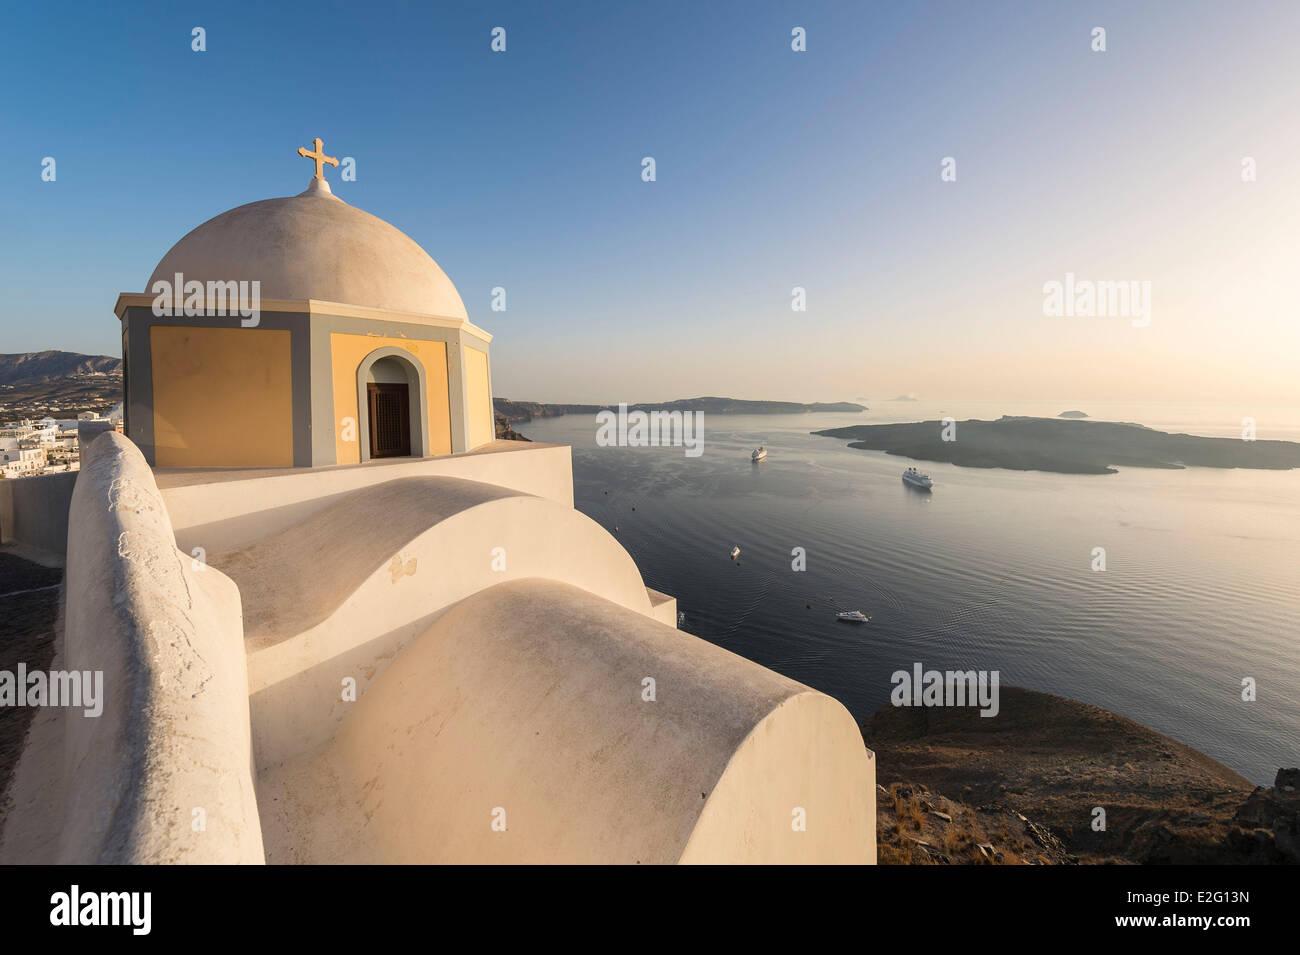 Las Islas Cícladas de Grecia la isla de Santorini (Thira) iglesia en Fira. Imagen De Stock